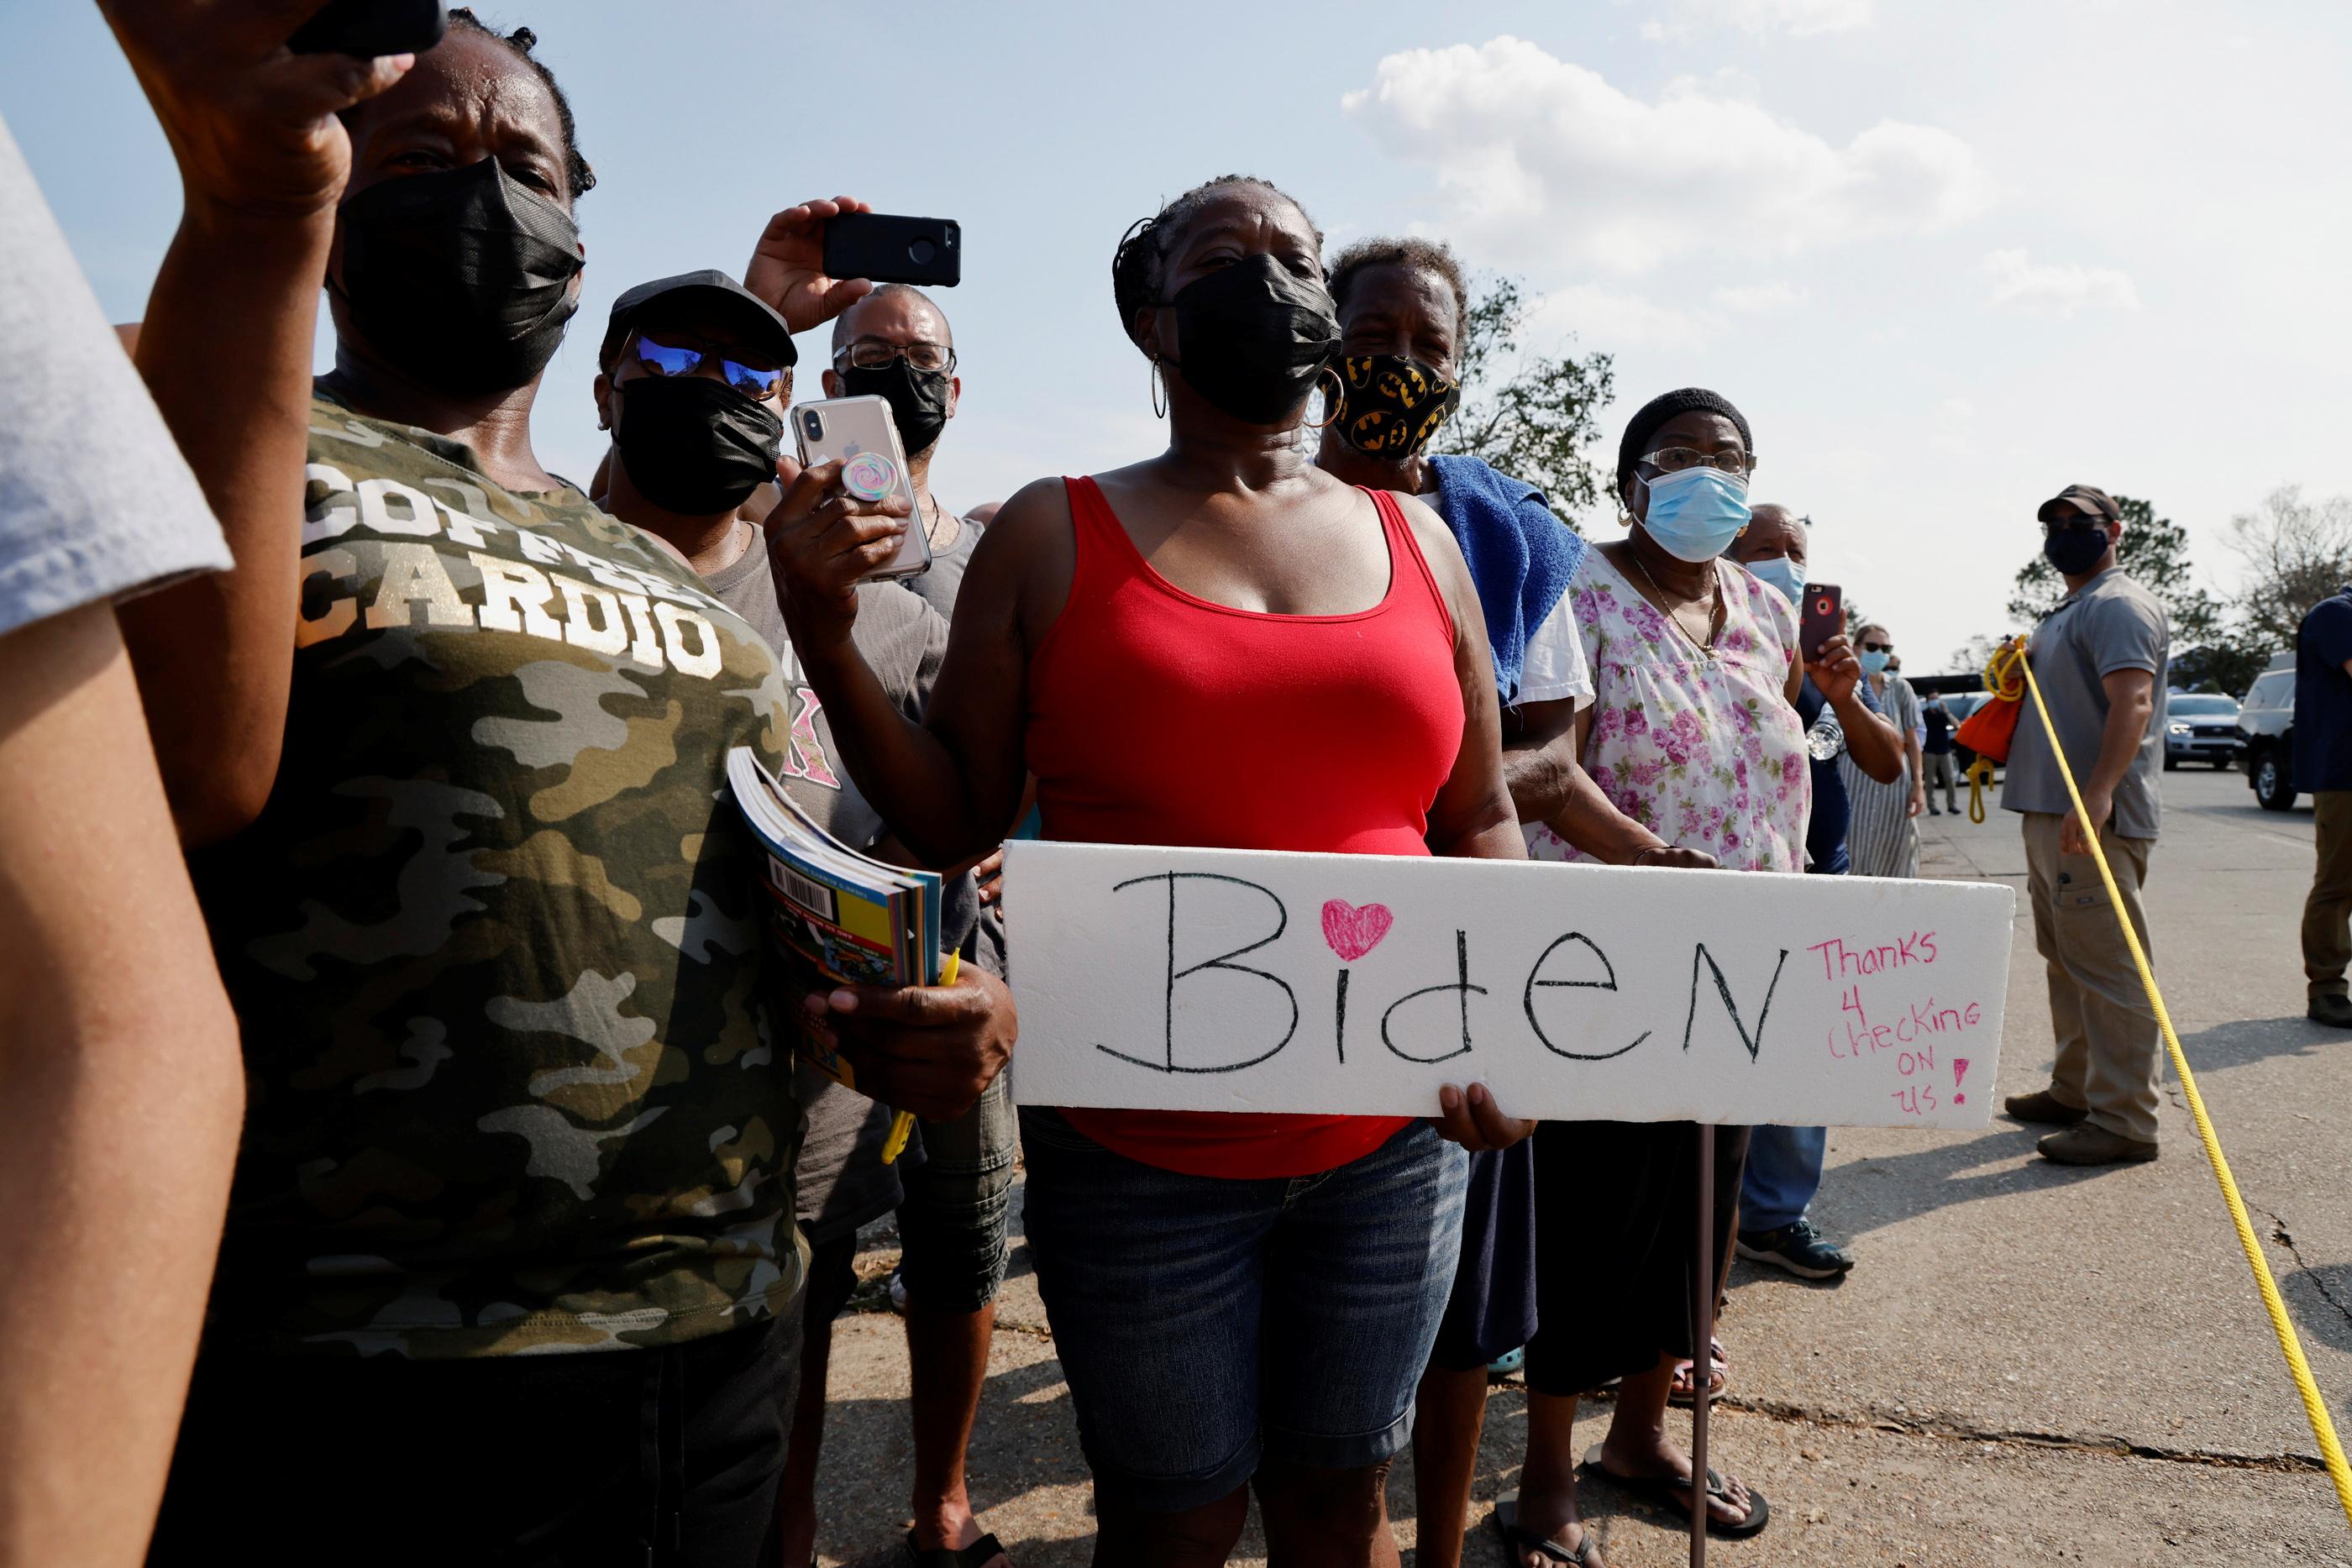 Local residents welcome U.S. President Joe Biden as he tours a neighbourhood hit by Hurricane Ida in LaPlace, Louisiana, U.S. September 3, 2021. REUTERS/Jonathan Ernst